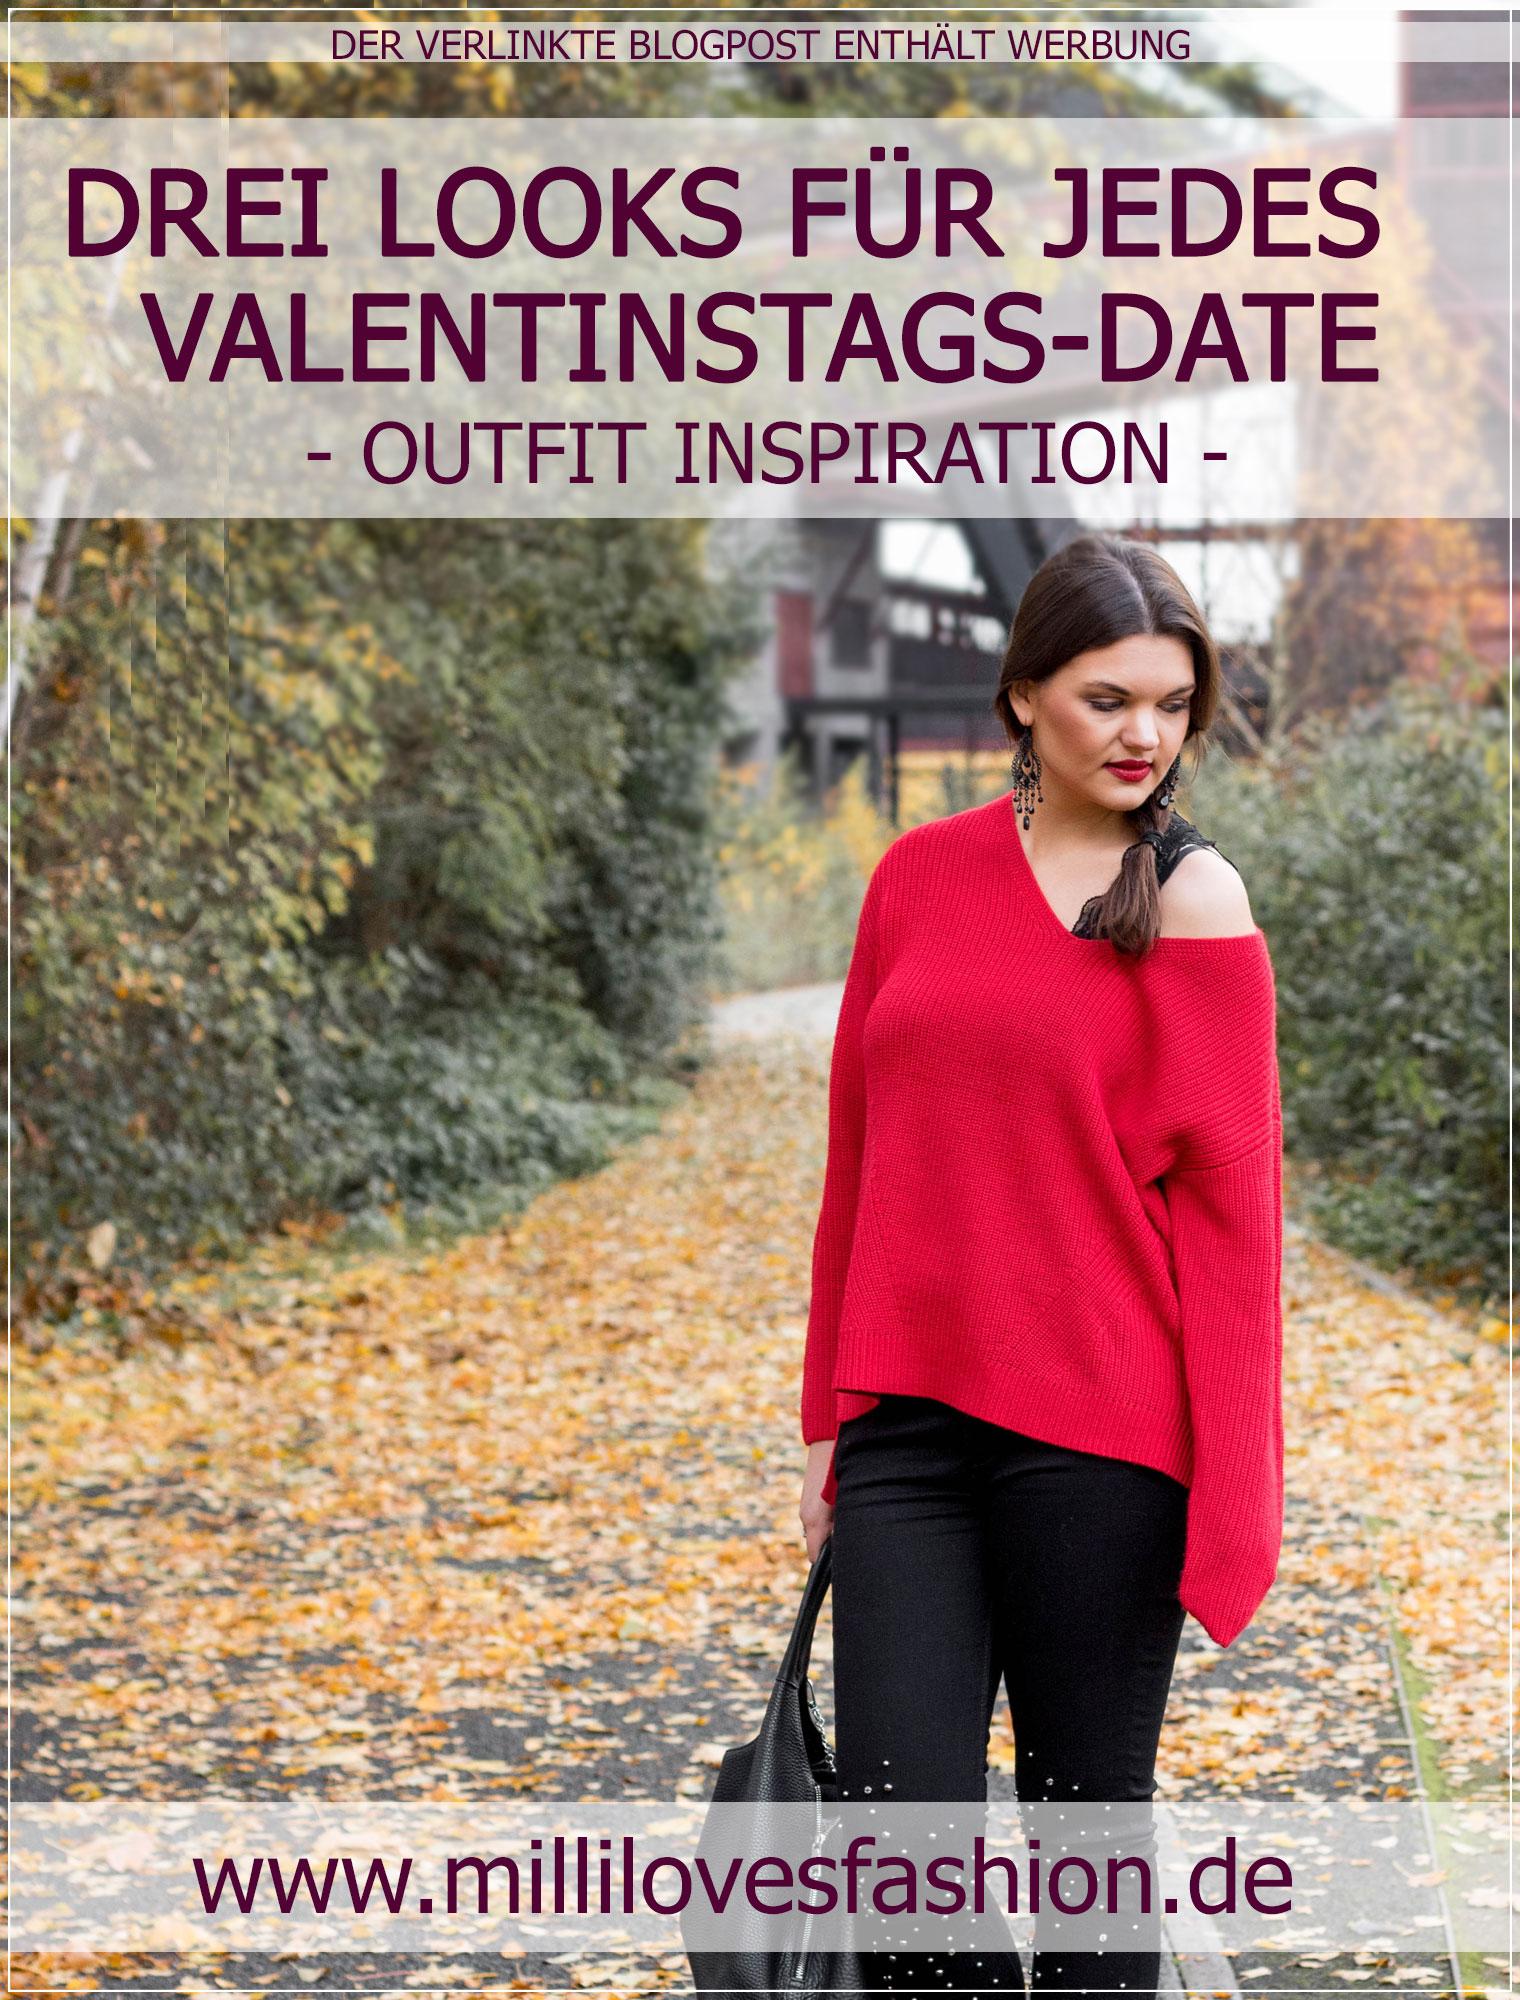 Valentinstag, Valentinstagsdate, Dateoutfit, Datenight, Look fuer Date, Blogger, Fashionblogger, Ruhrgebiet, Modeblog, Fashionblog